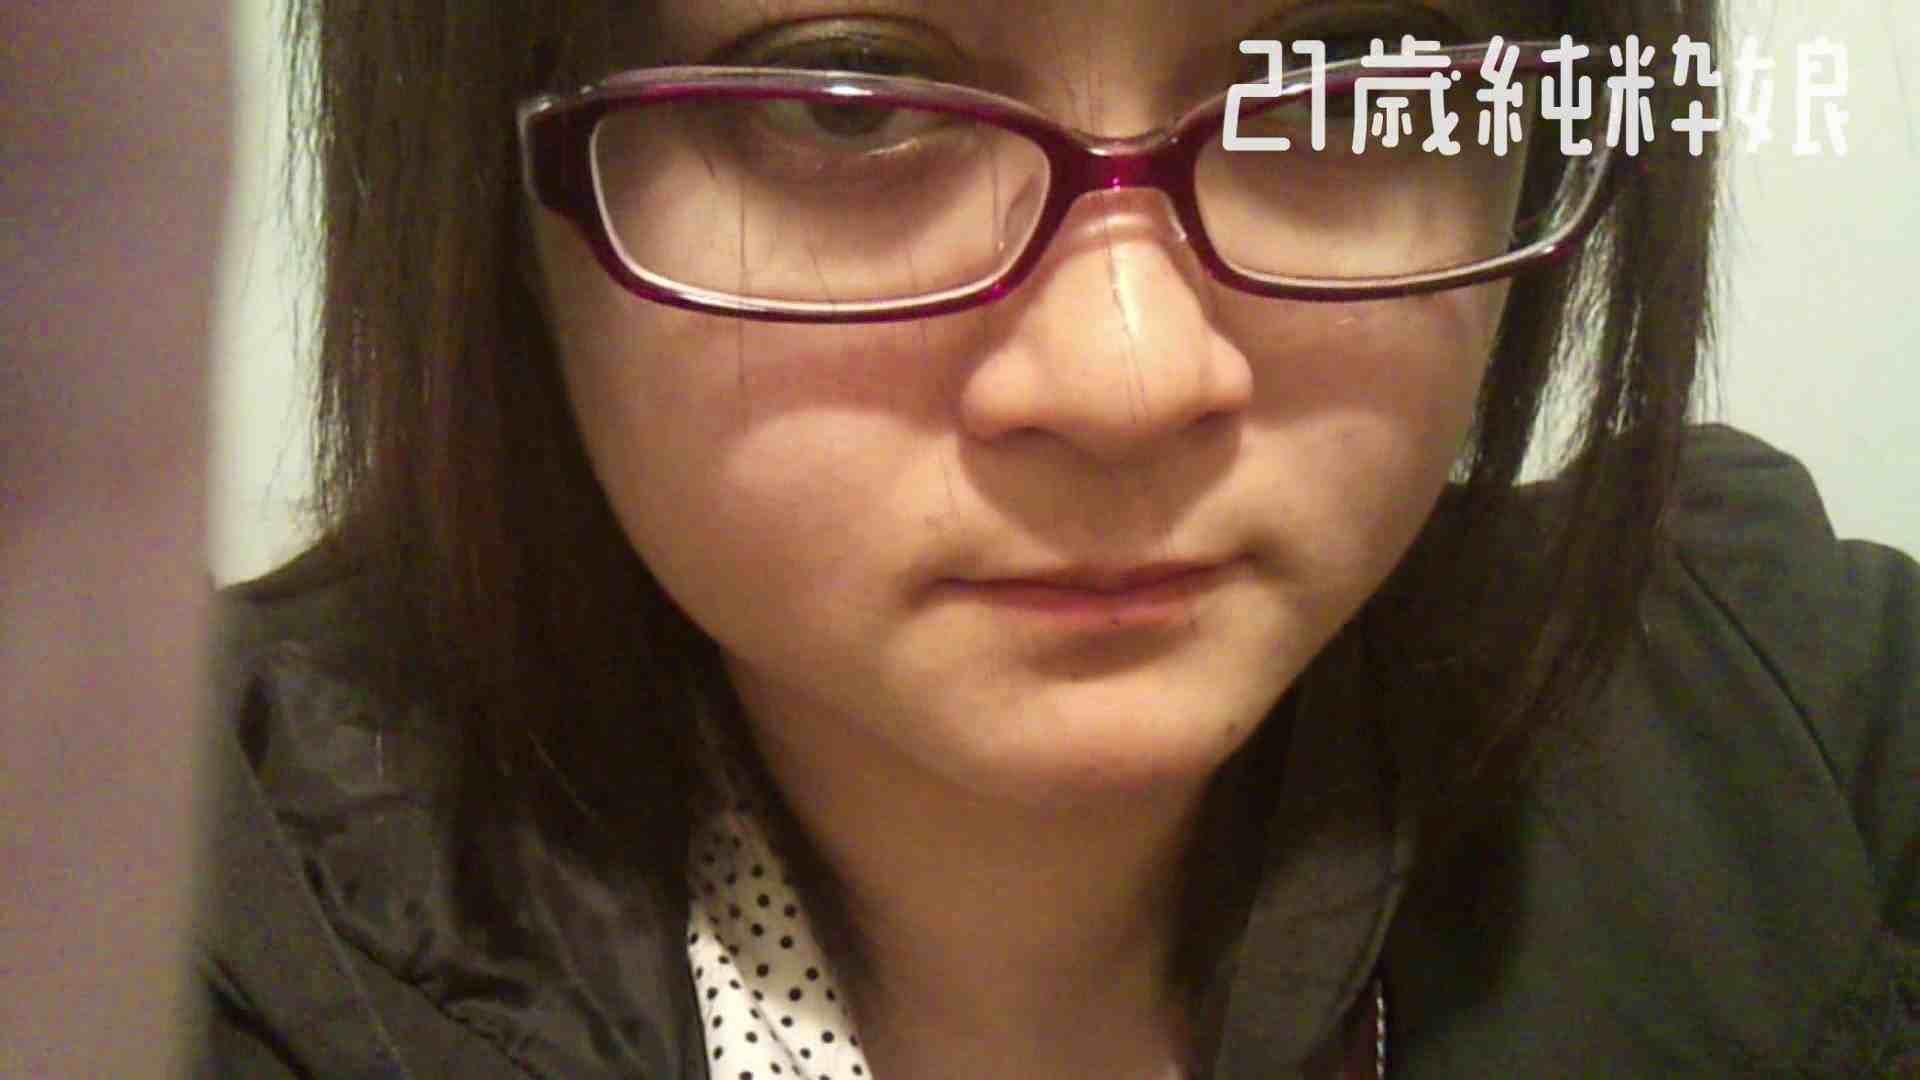 Gカップ21歳純粋嬢第2弾Vol.5 美女OL  78連発 66